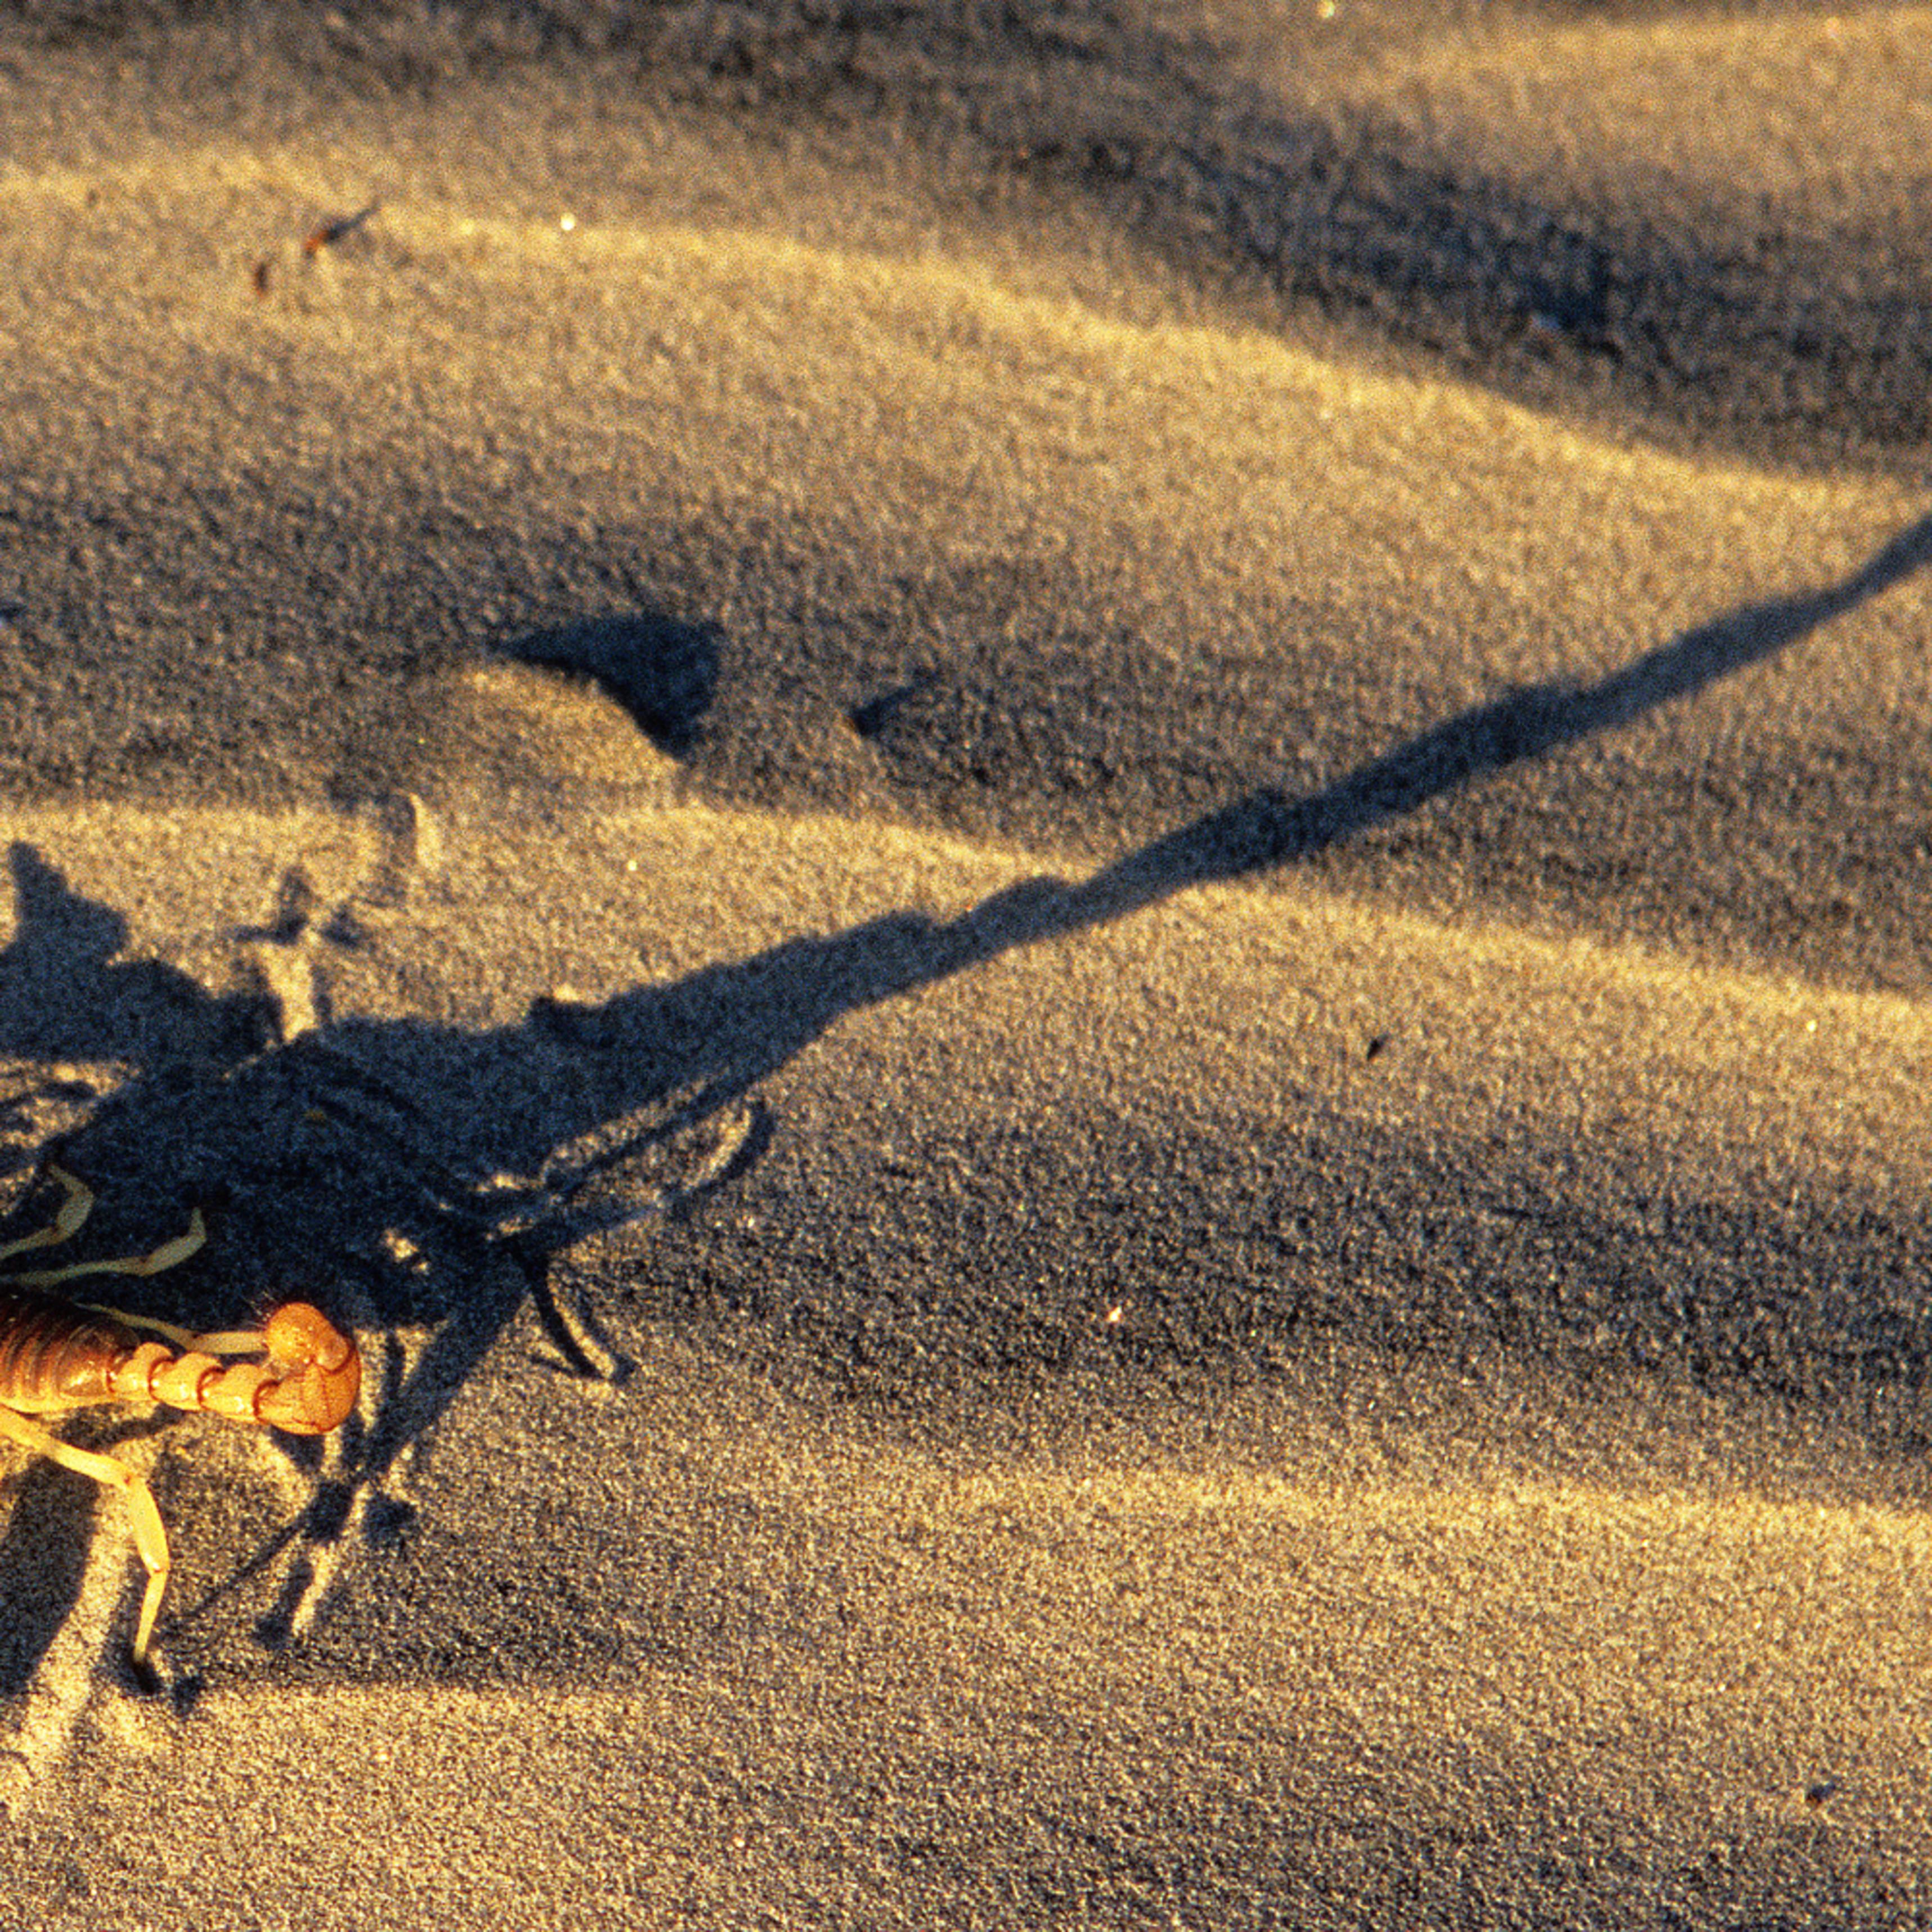 Scorpion bhseus